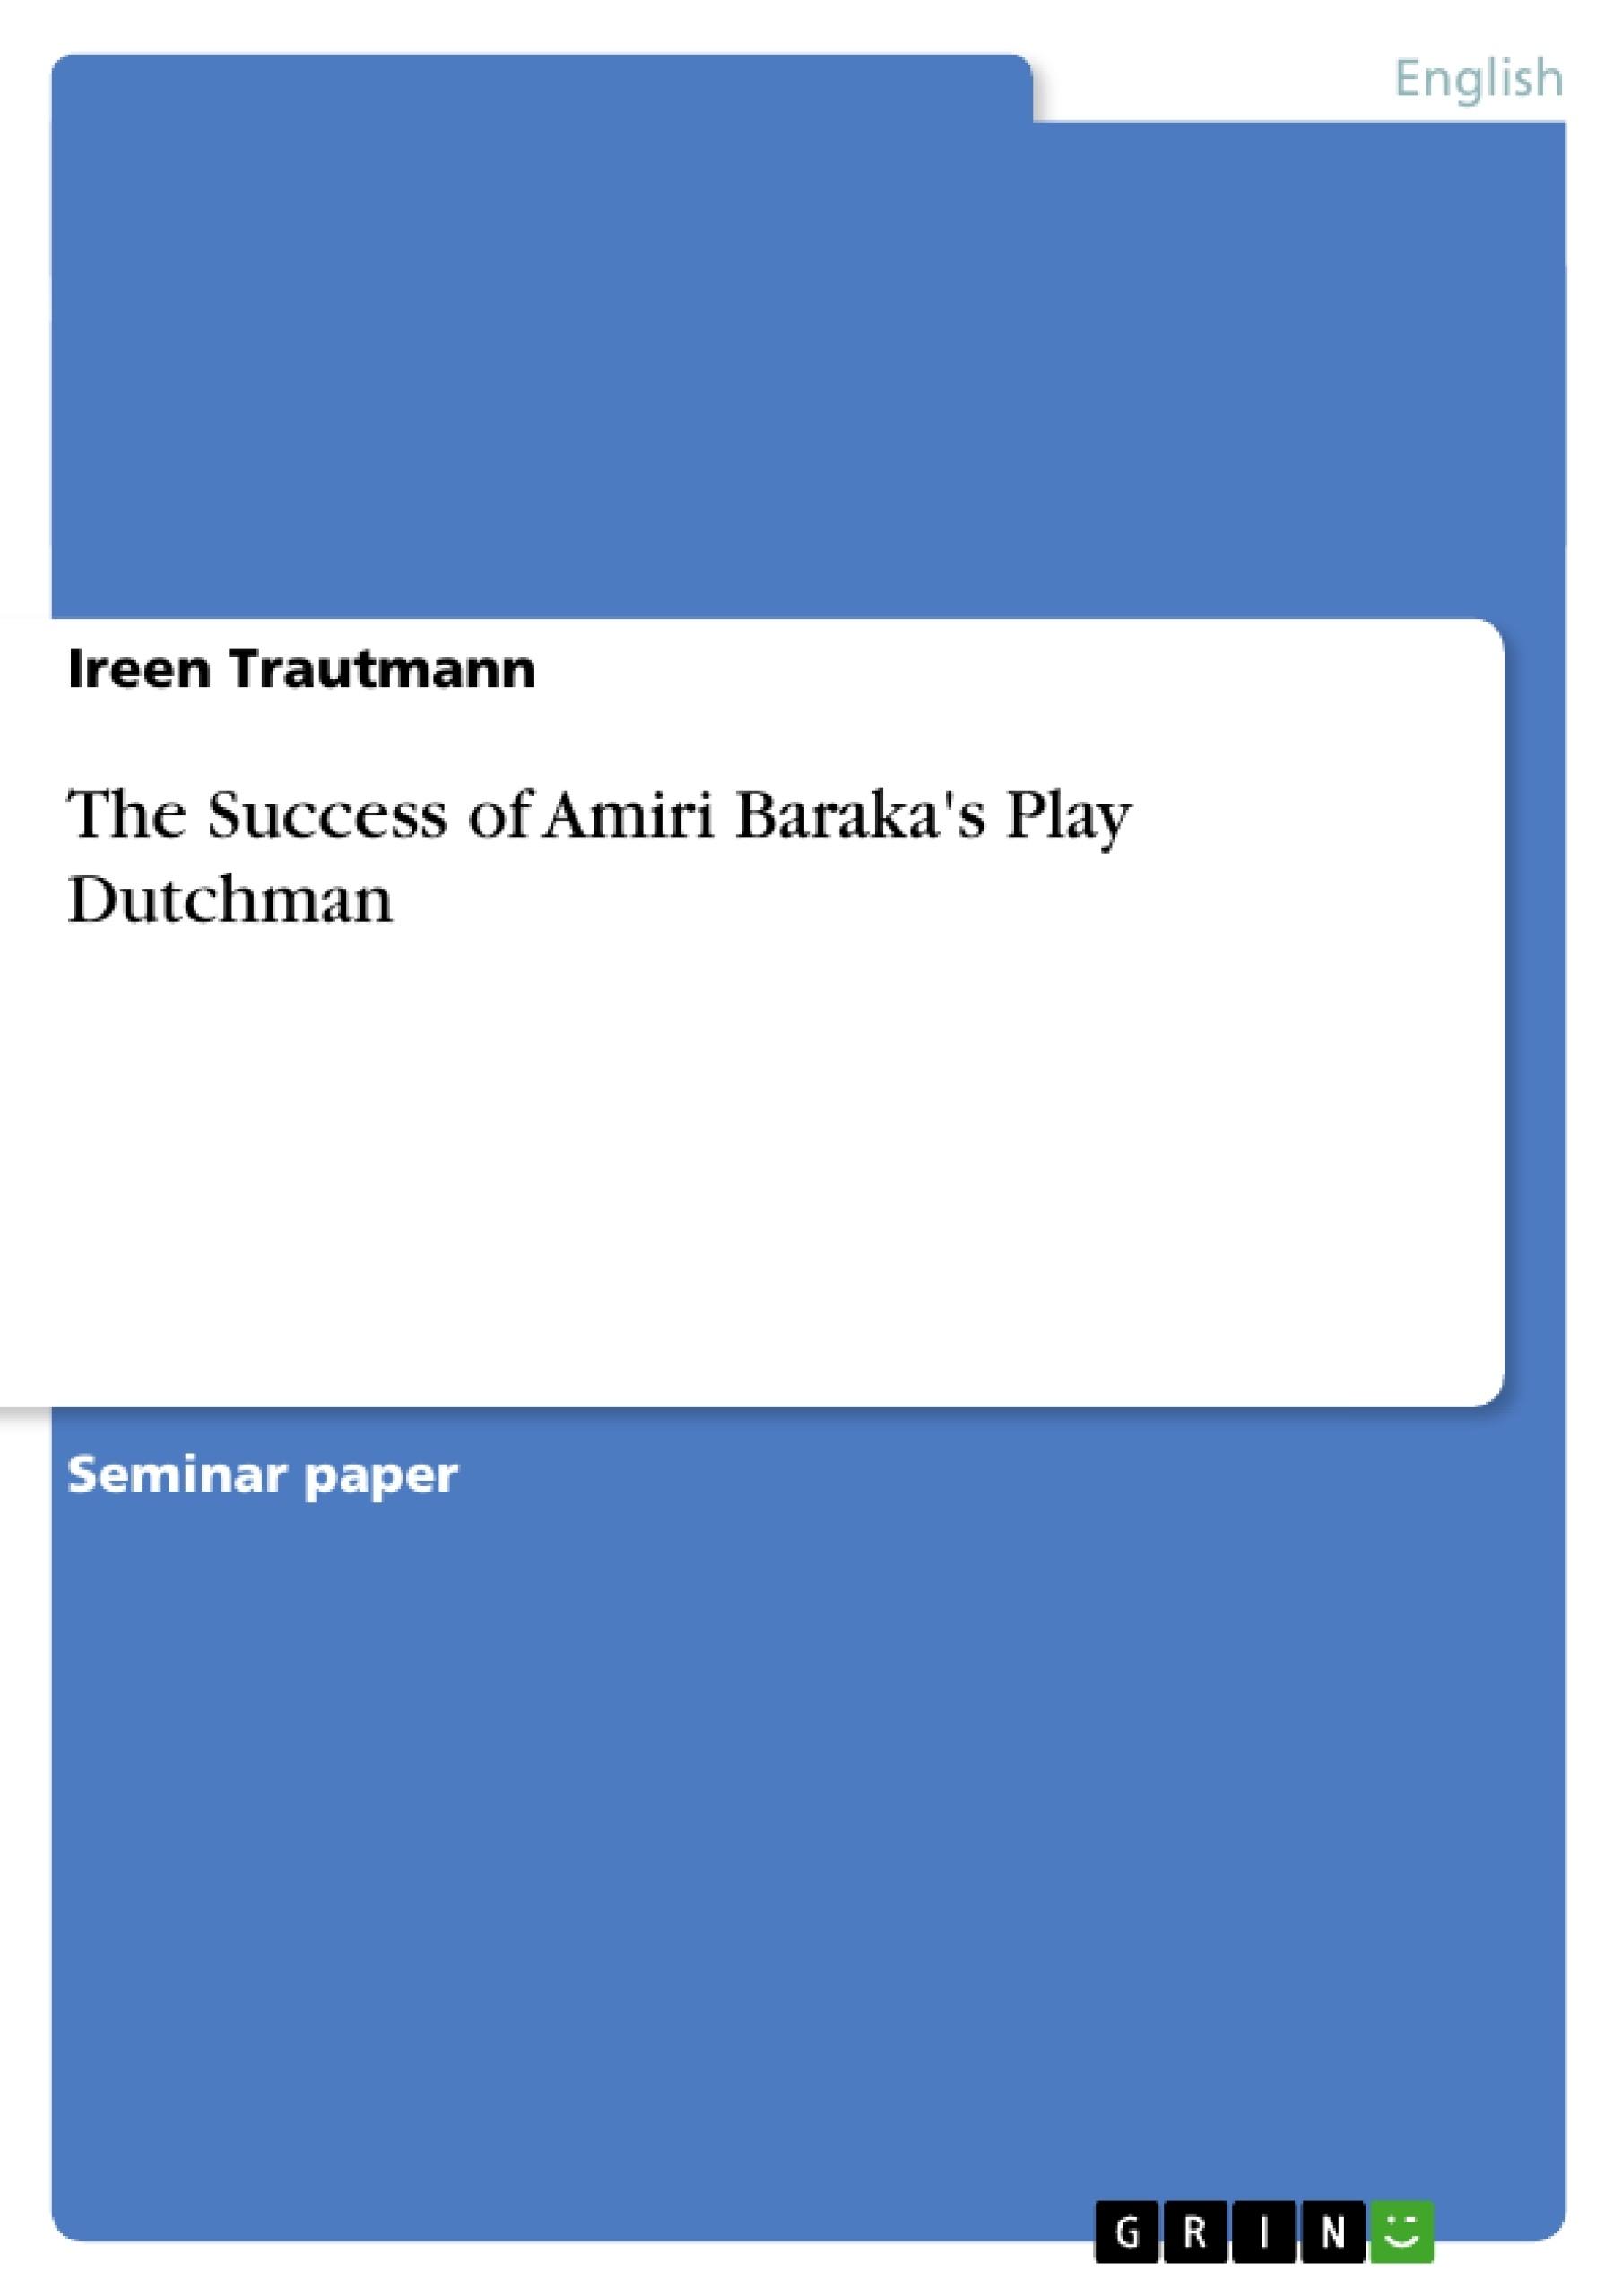 Title: The Success of Amiri Baraka's Play Dutchman